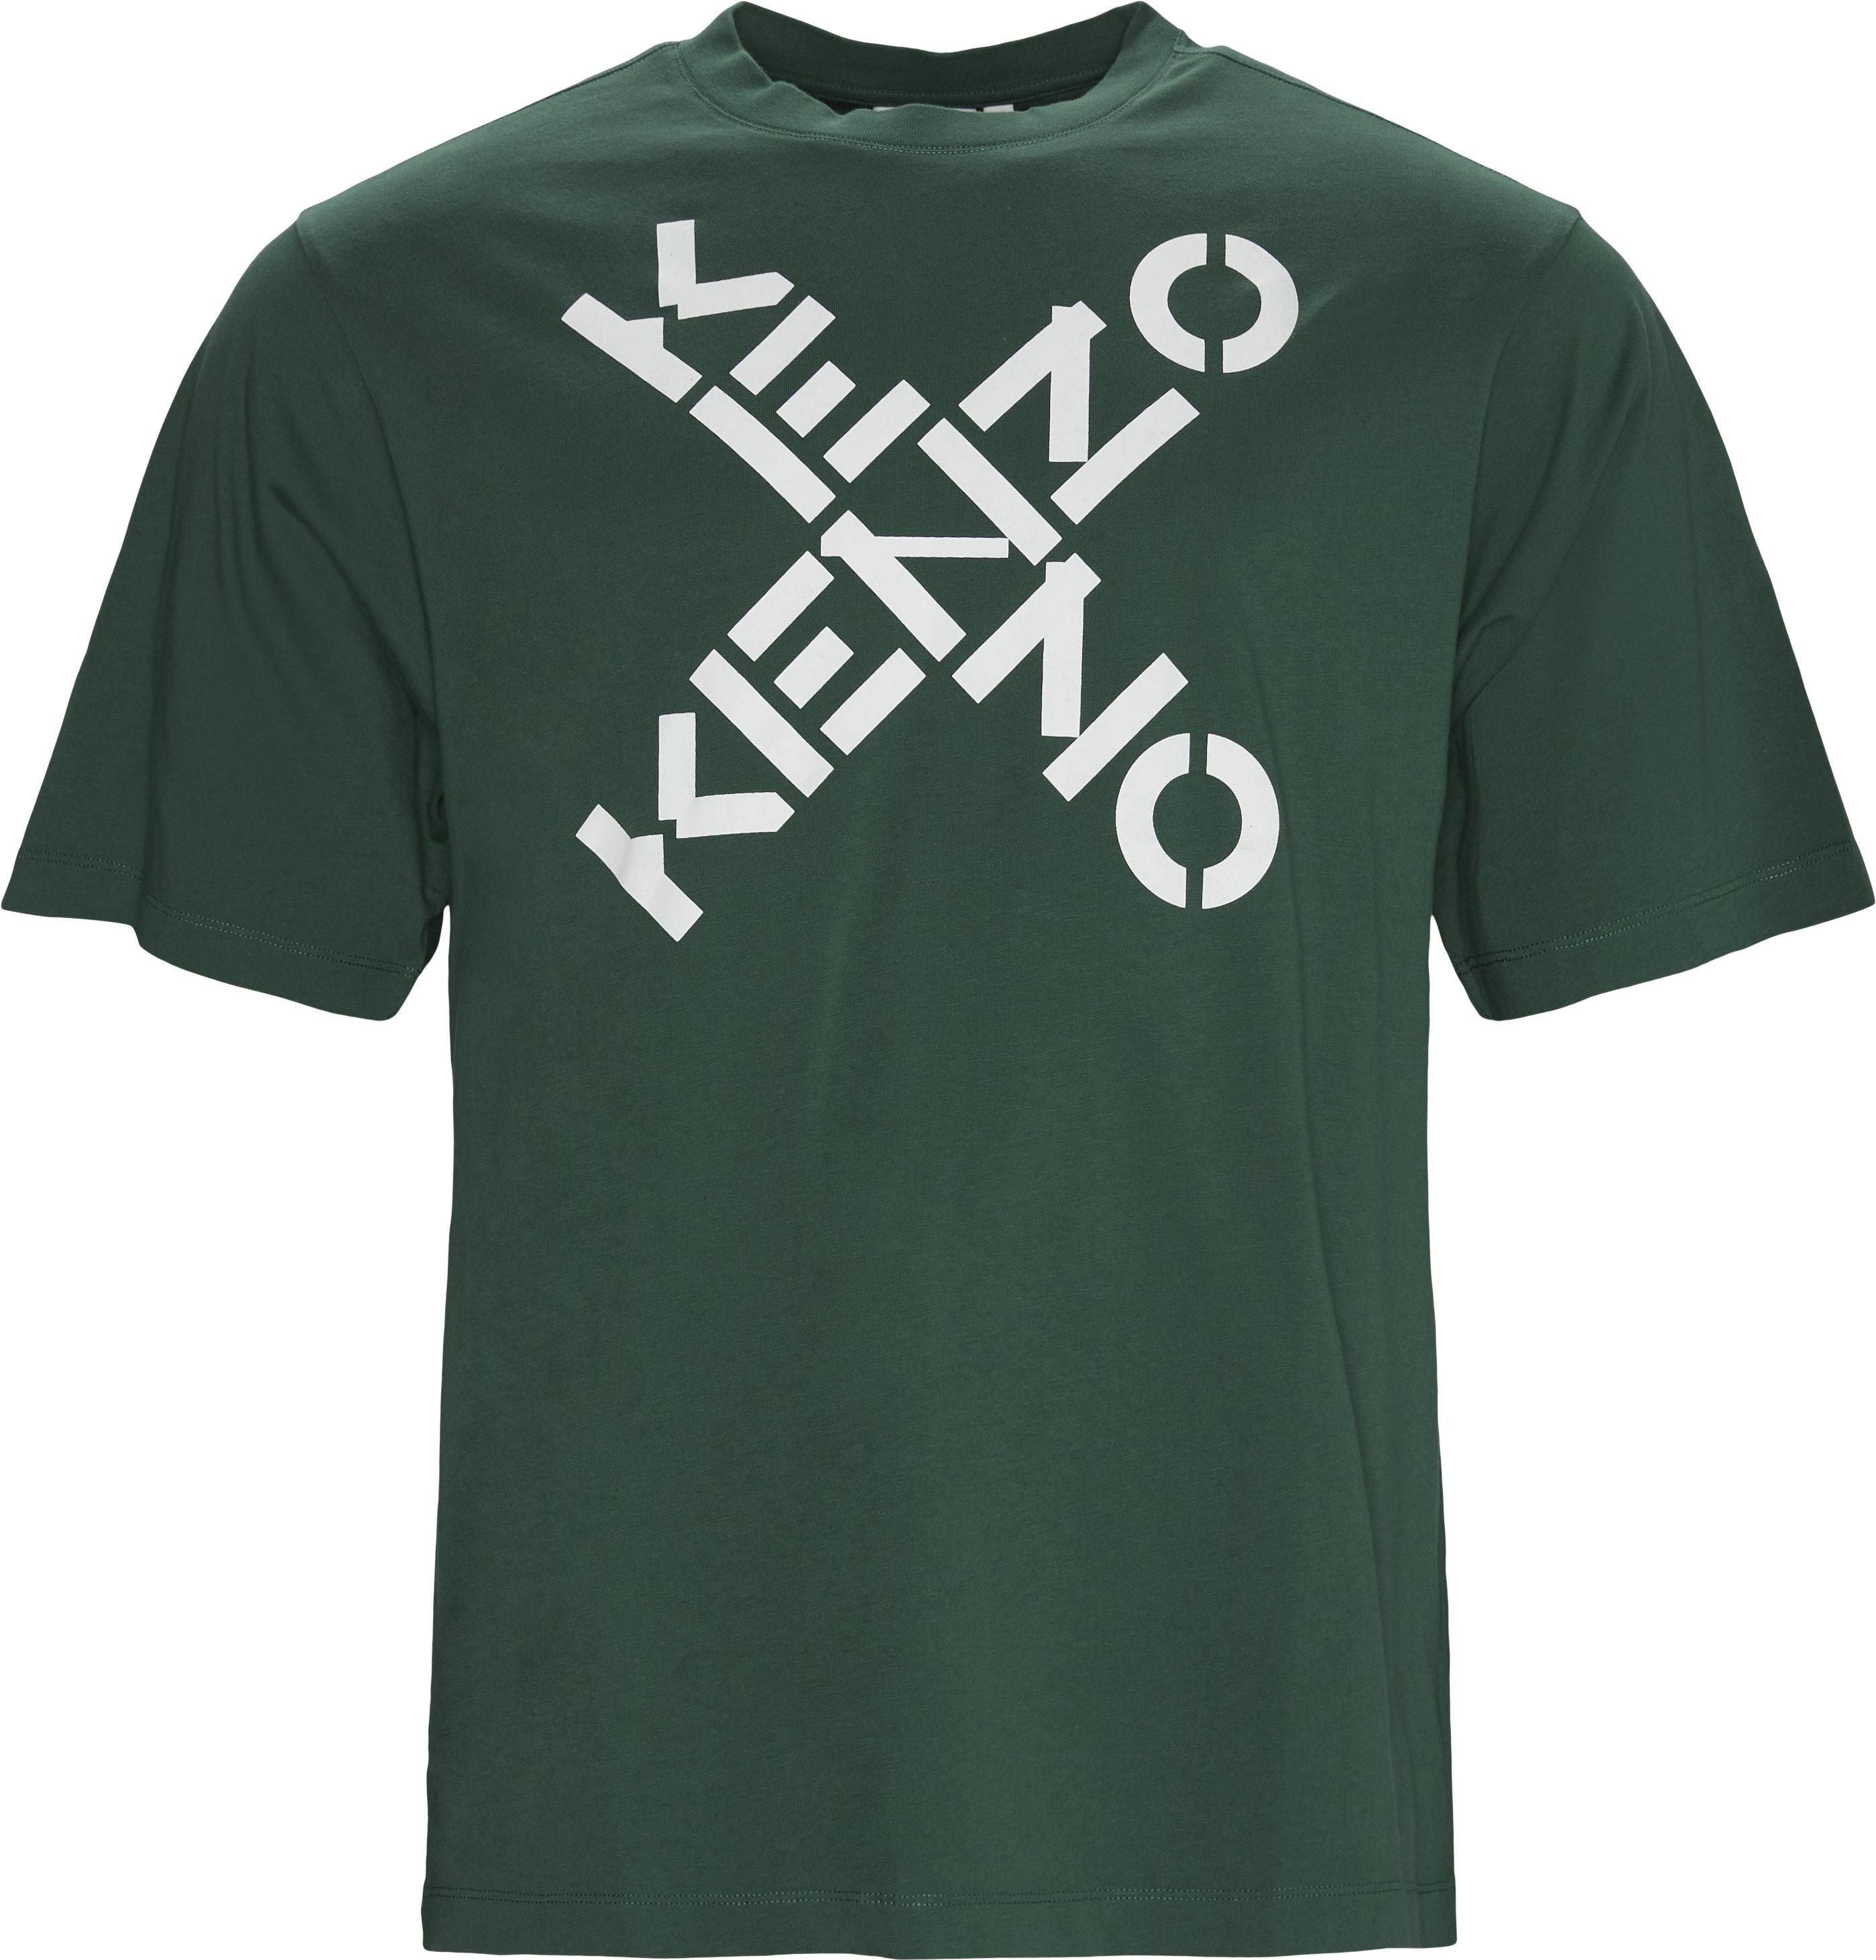 T-shirts - Oversize fit - Grøn